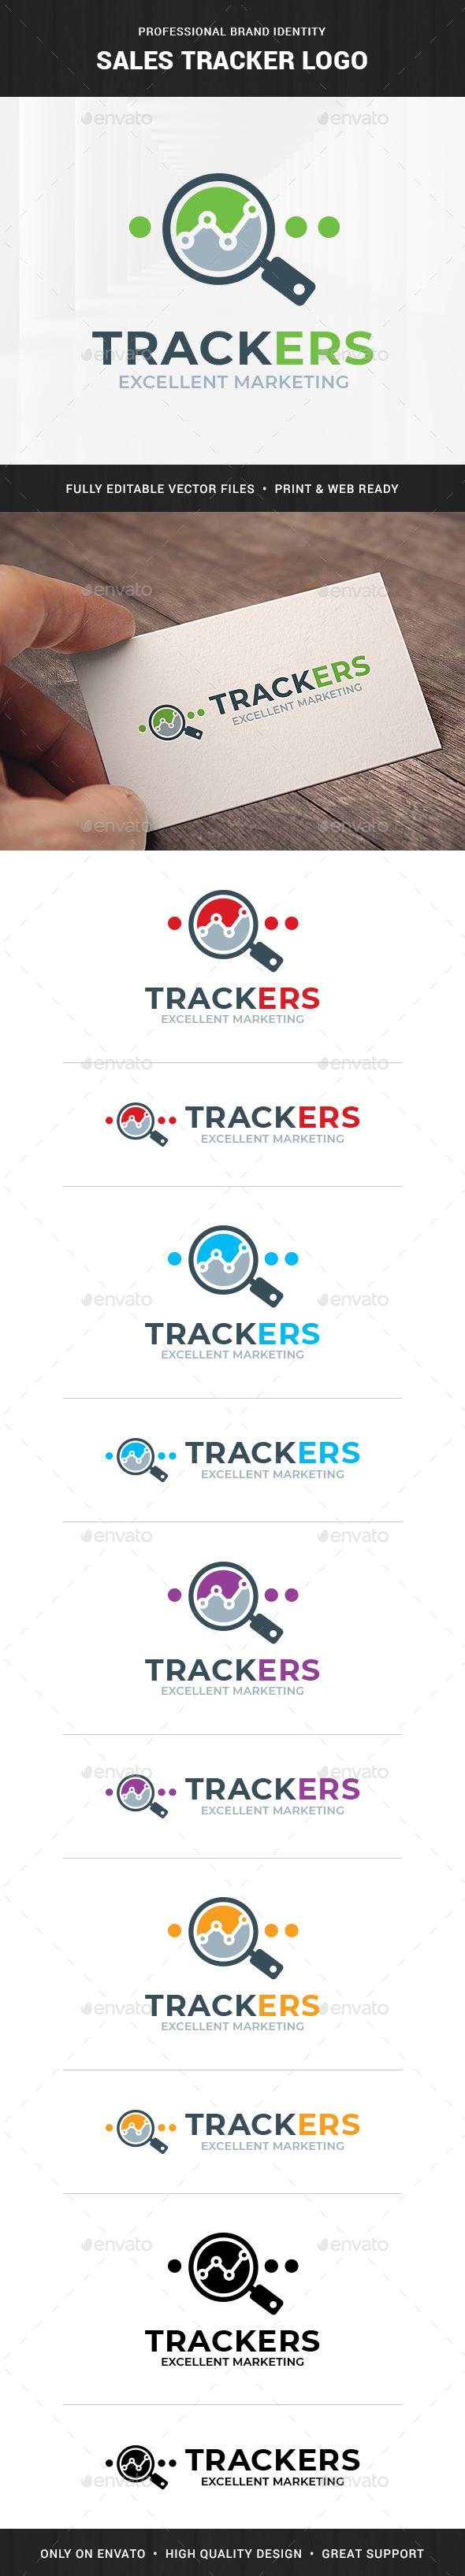 Sales Tracker Logo Template